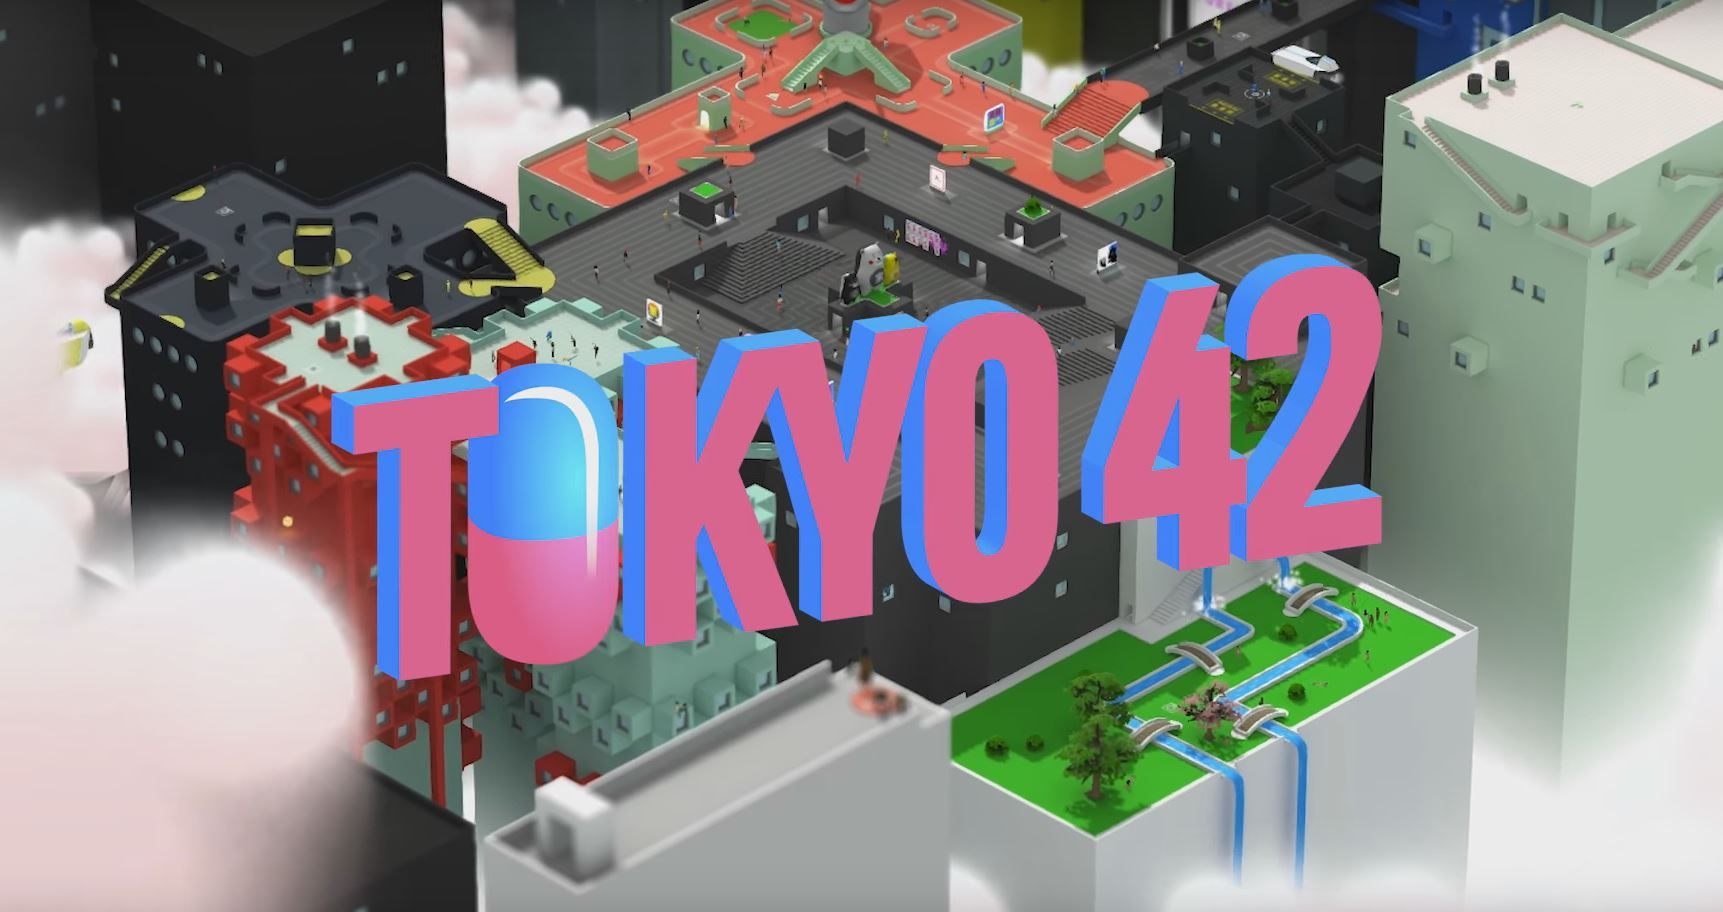 tokyo 42 logo